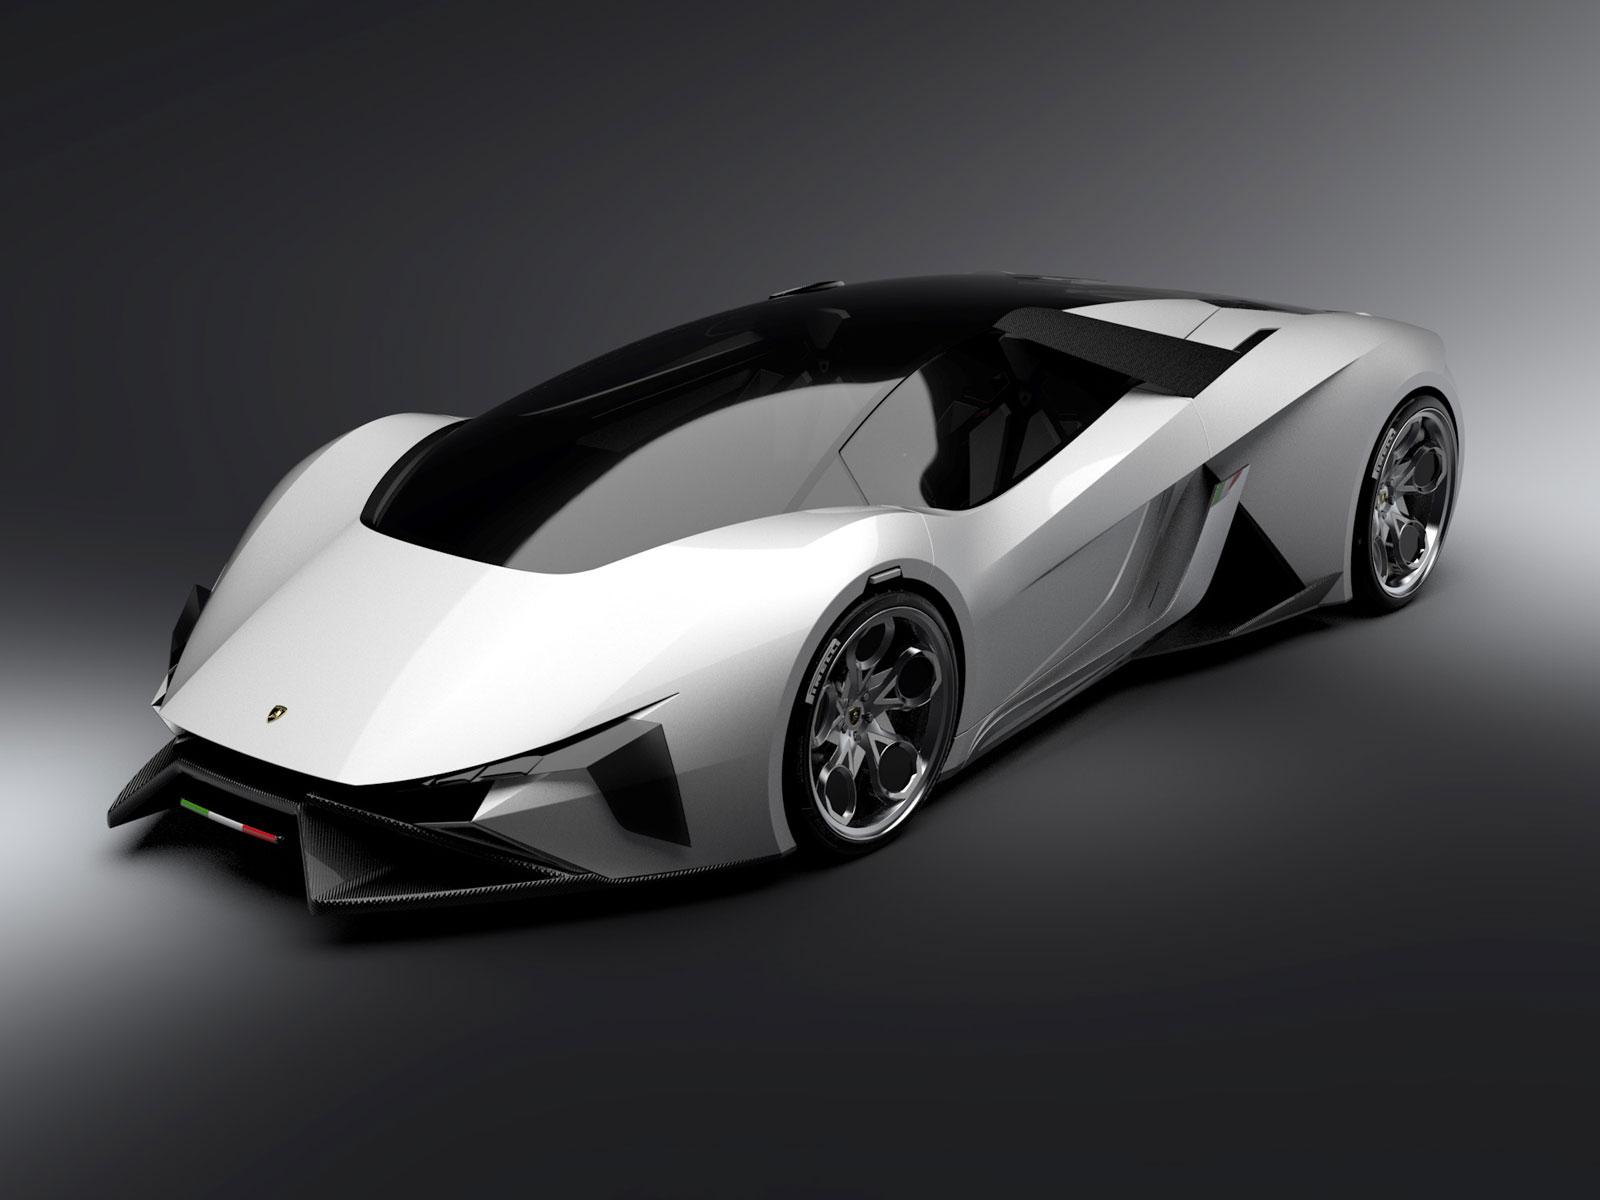 Merveilleux Lamborghini Diamante Concept